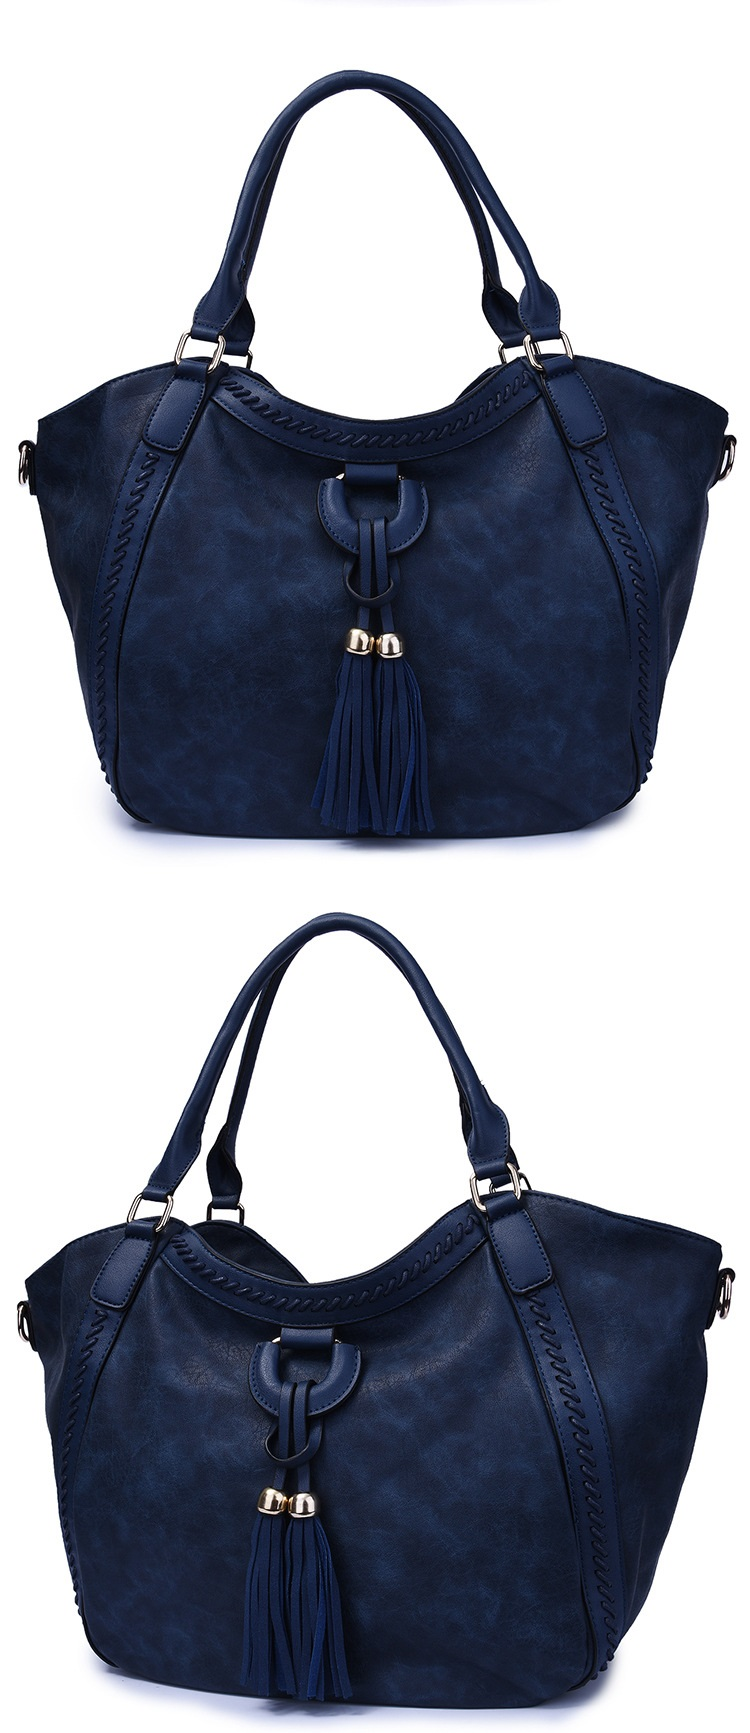 NIGEDU Leather Casual Tassel Handbag Large Famous Brands Designers Pu Leather Handbags Women Big Tote Bags Female Messenger Bags Bolsos Blue (5)